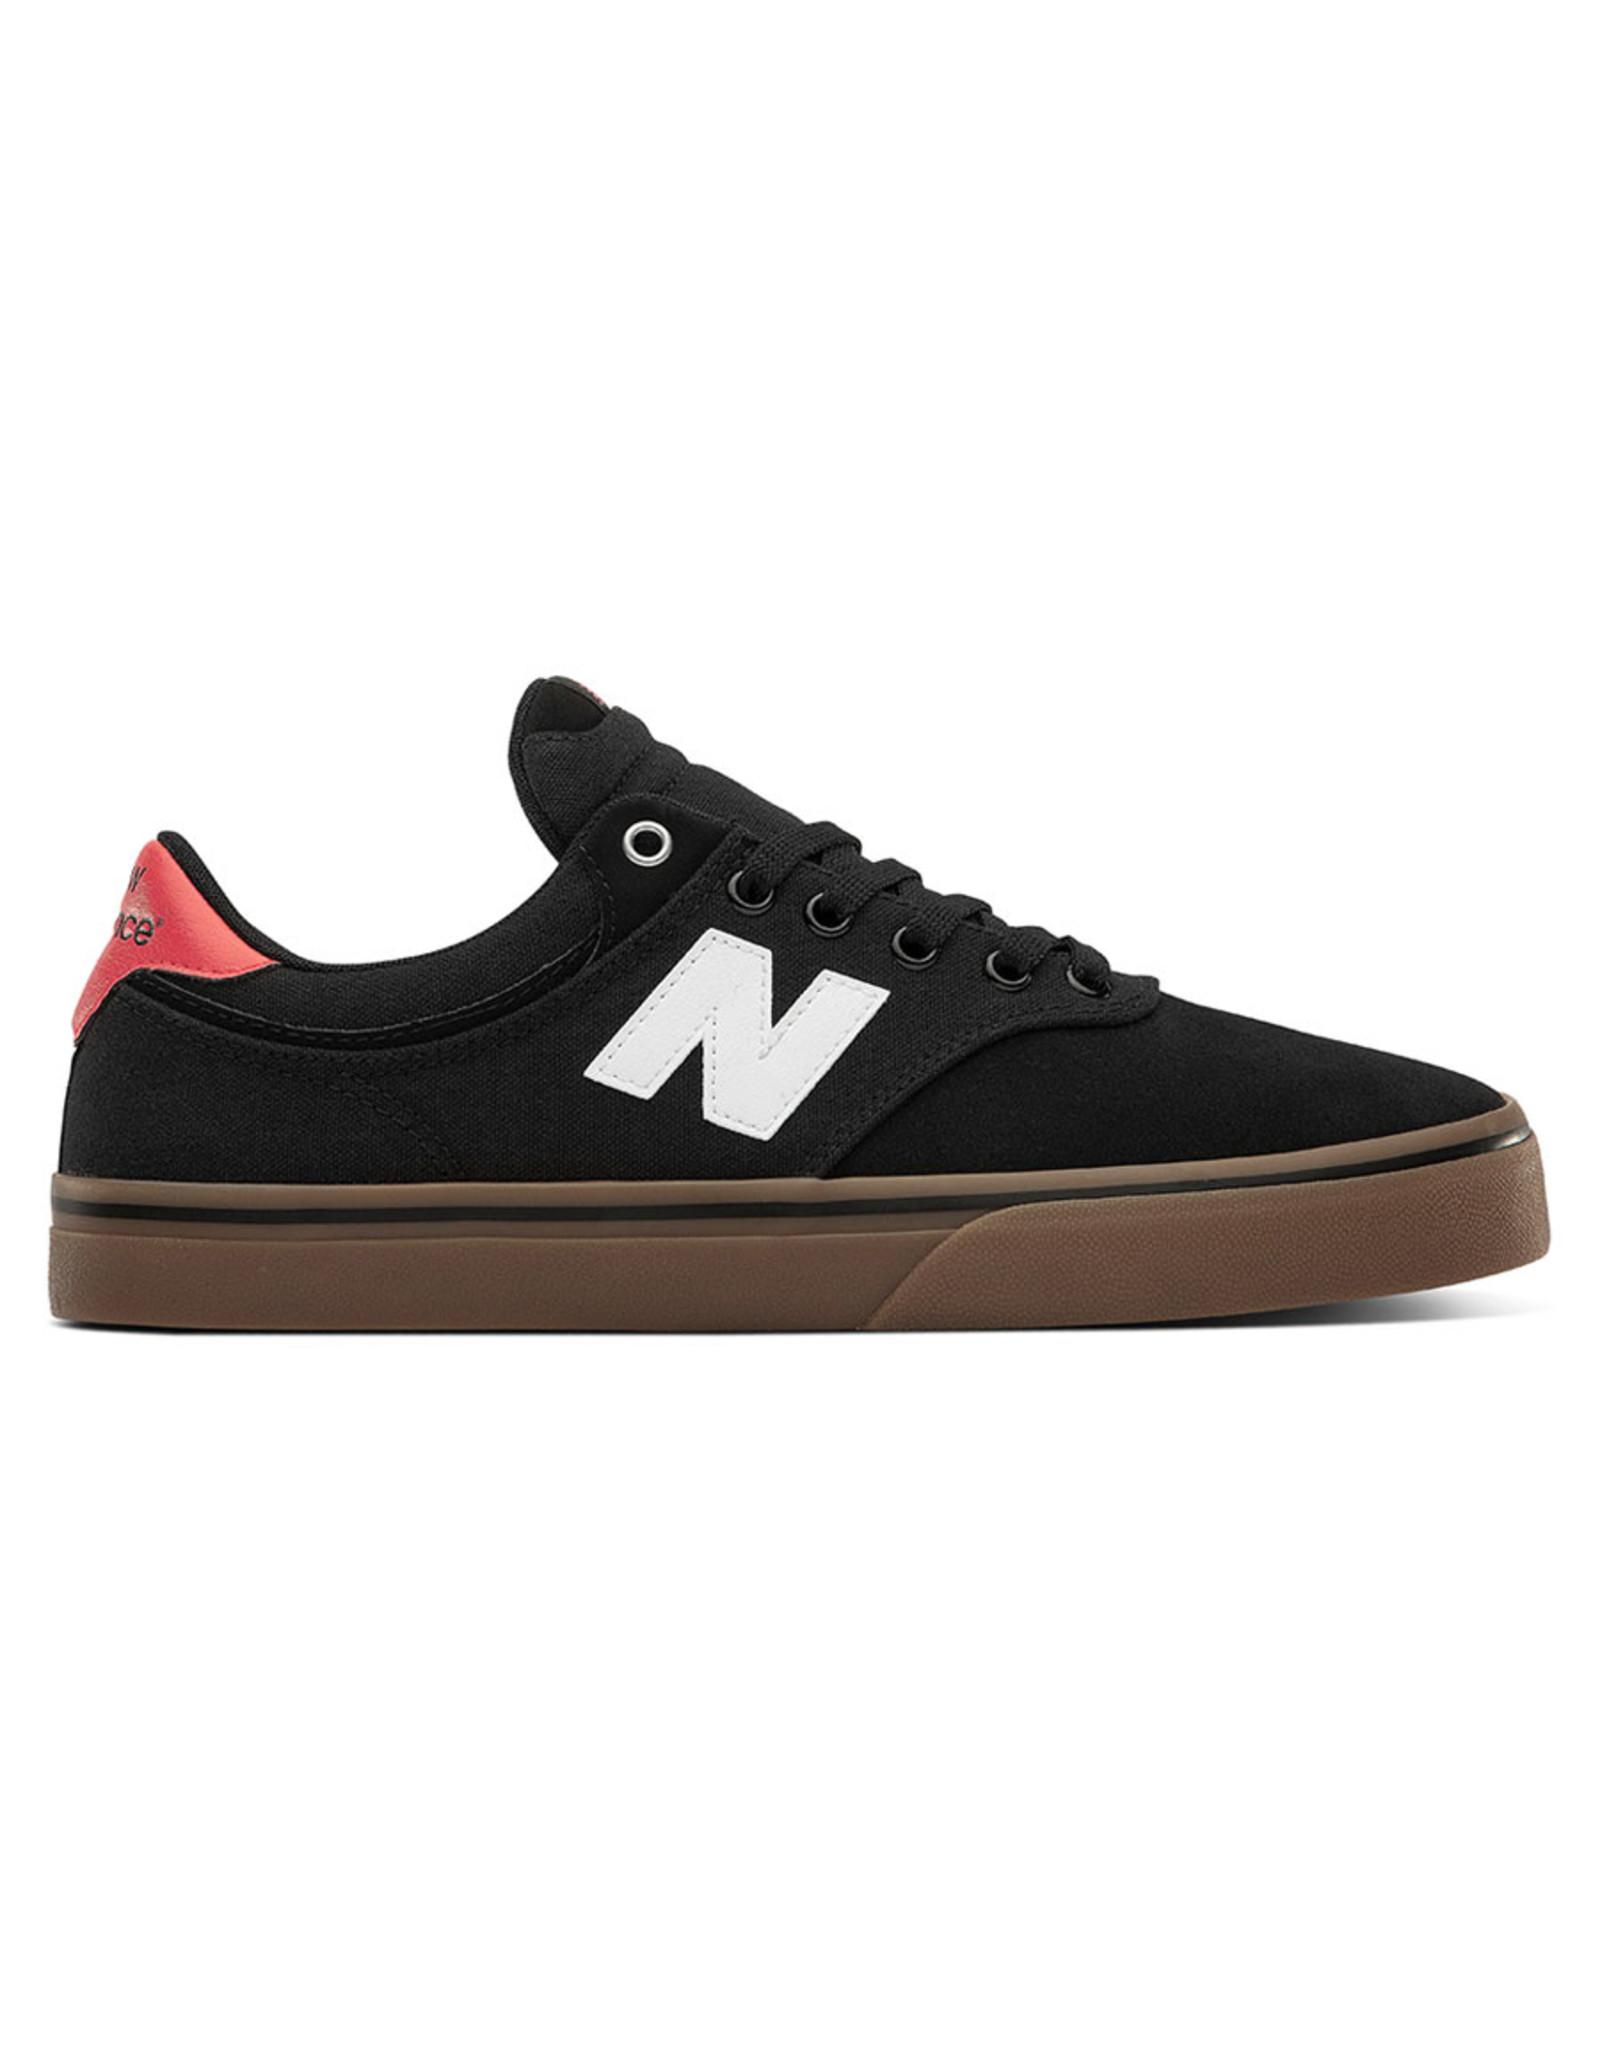 New Balance Numeric New Balance Numeric Shoe 255 (Black/Red/Gum)